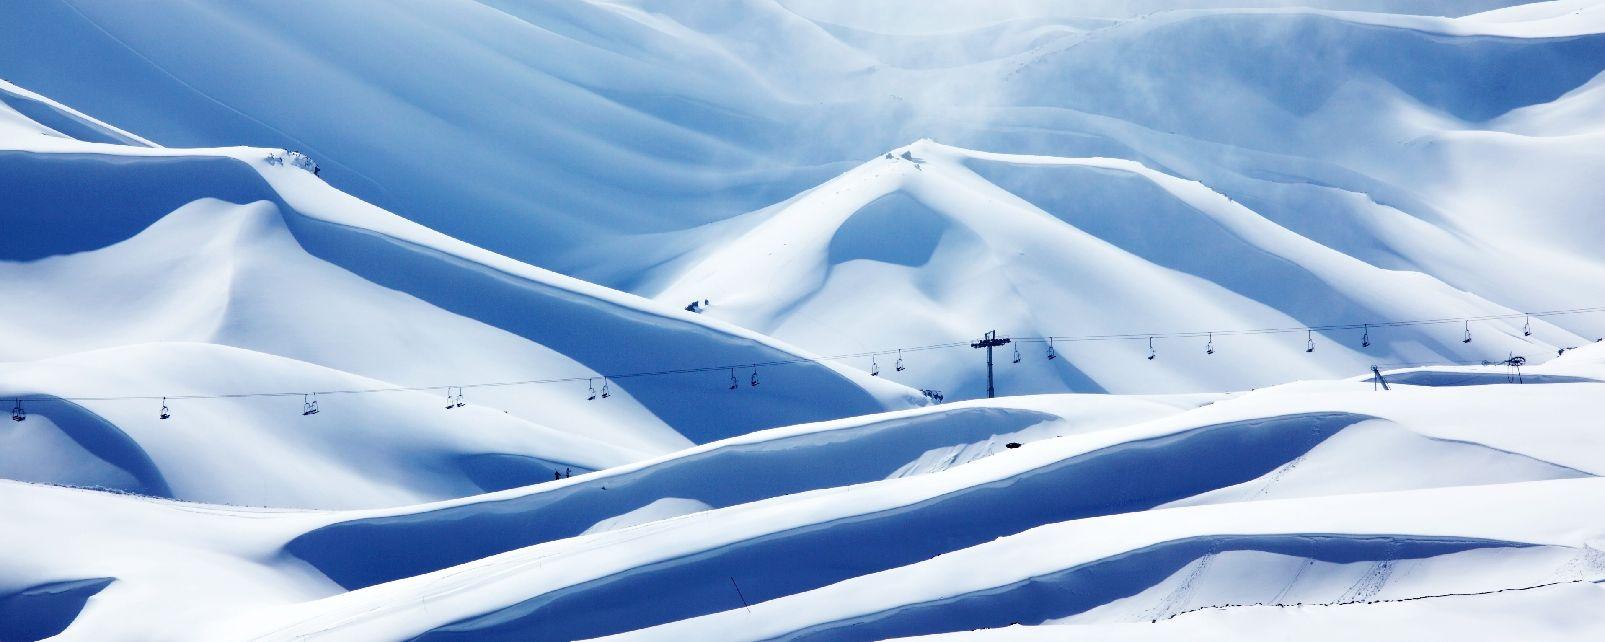 La station de ski des Cèdres de Becharré , Liban